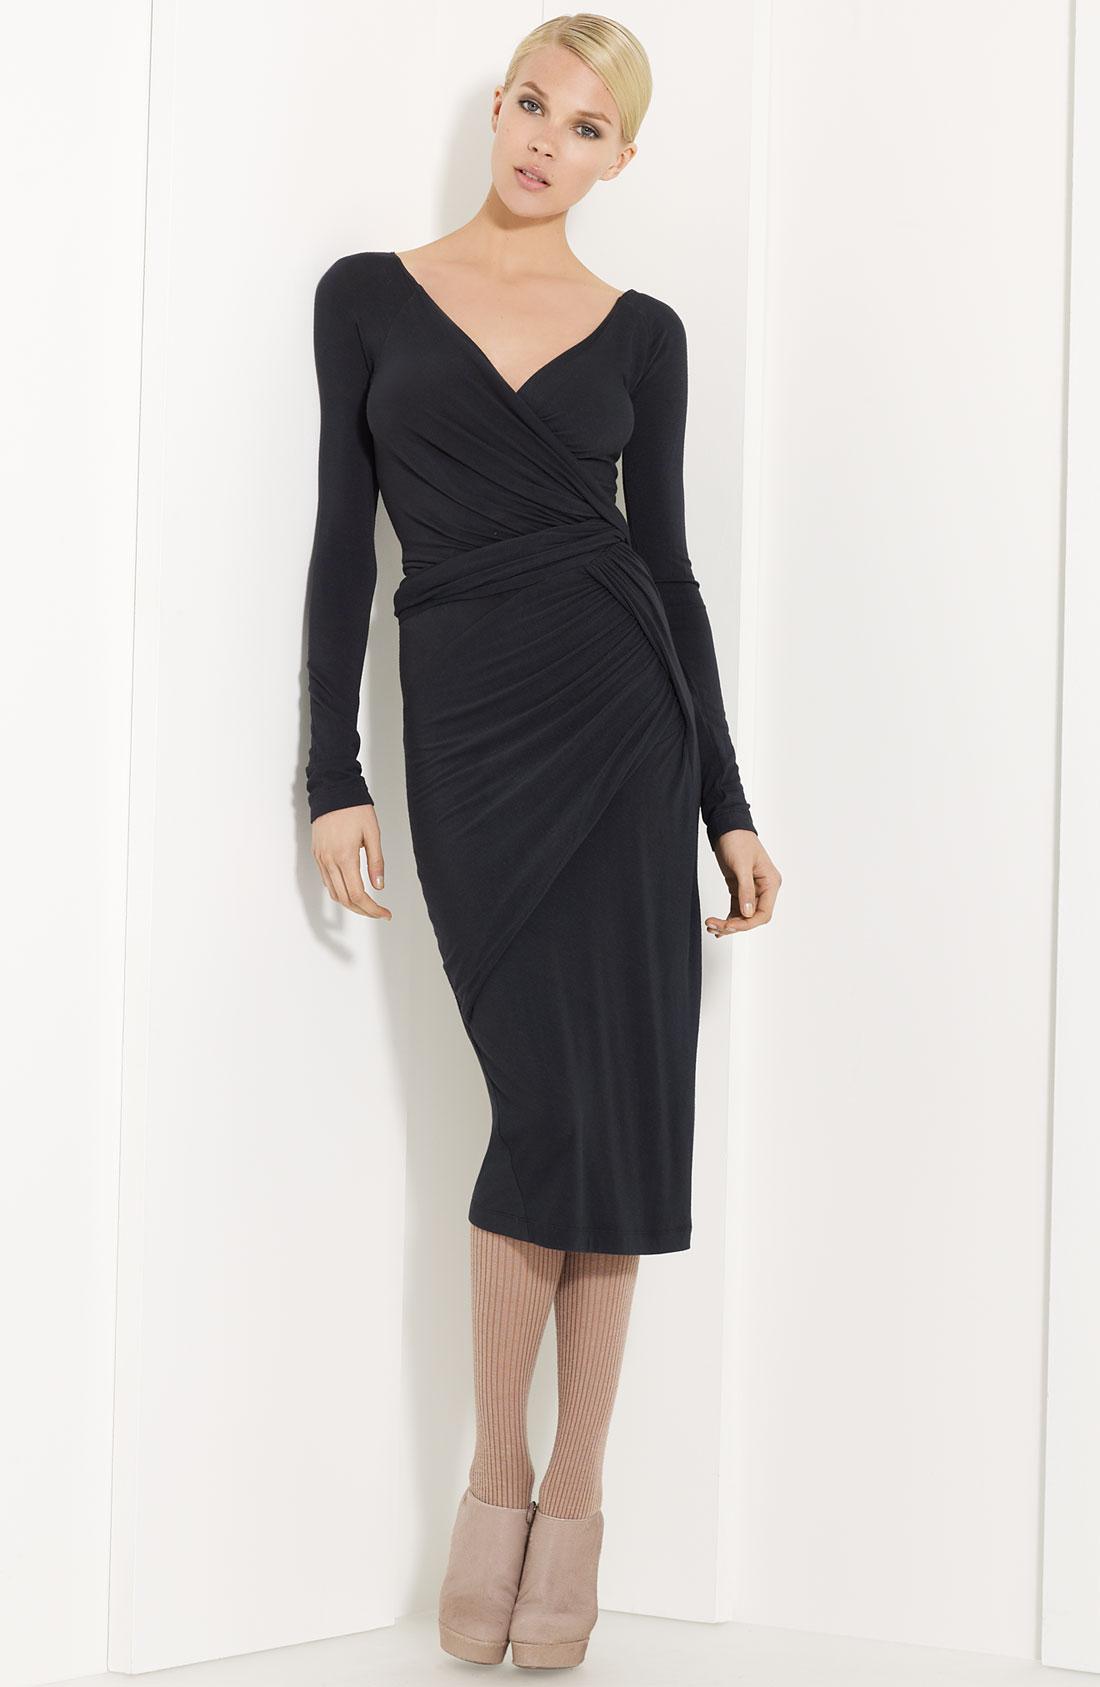 Donna karan new york collection draped jersey dress in for Donna karan new york